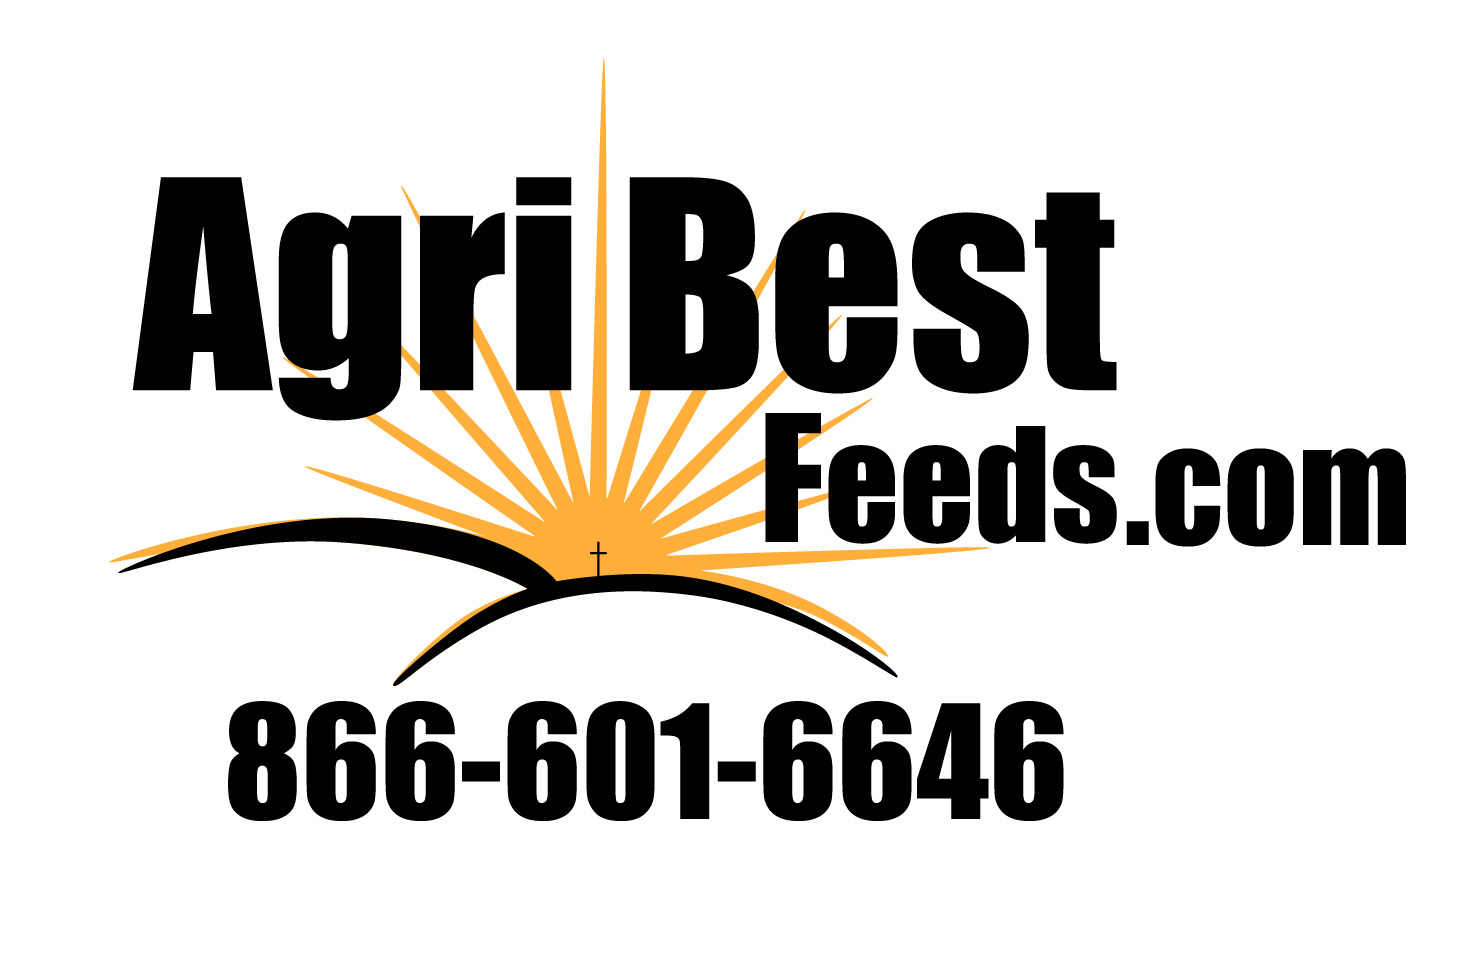 agribest feeds - web sponsor